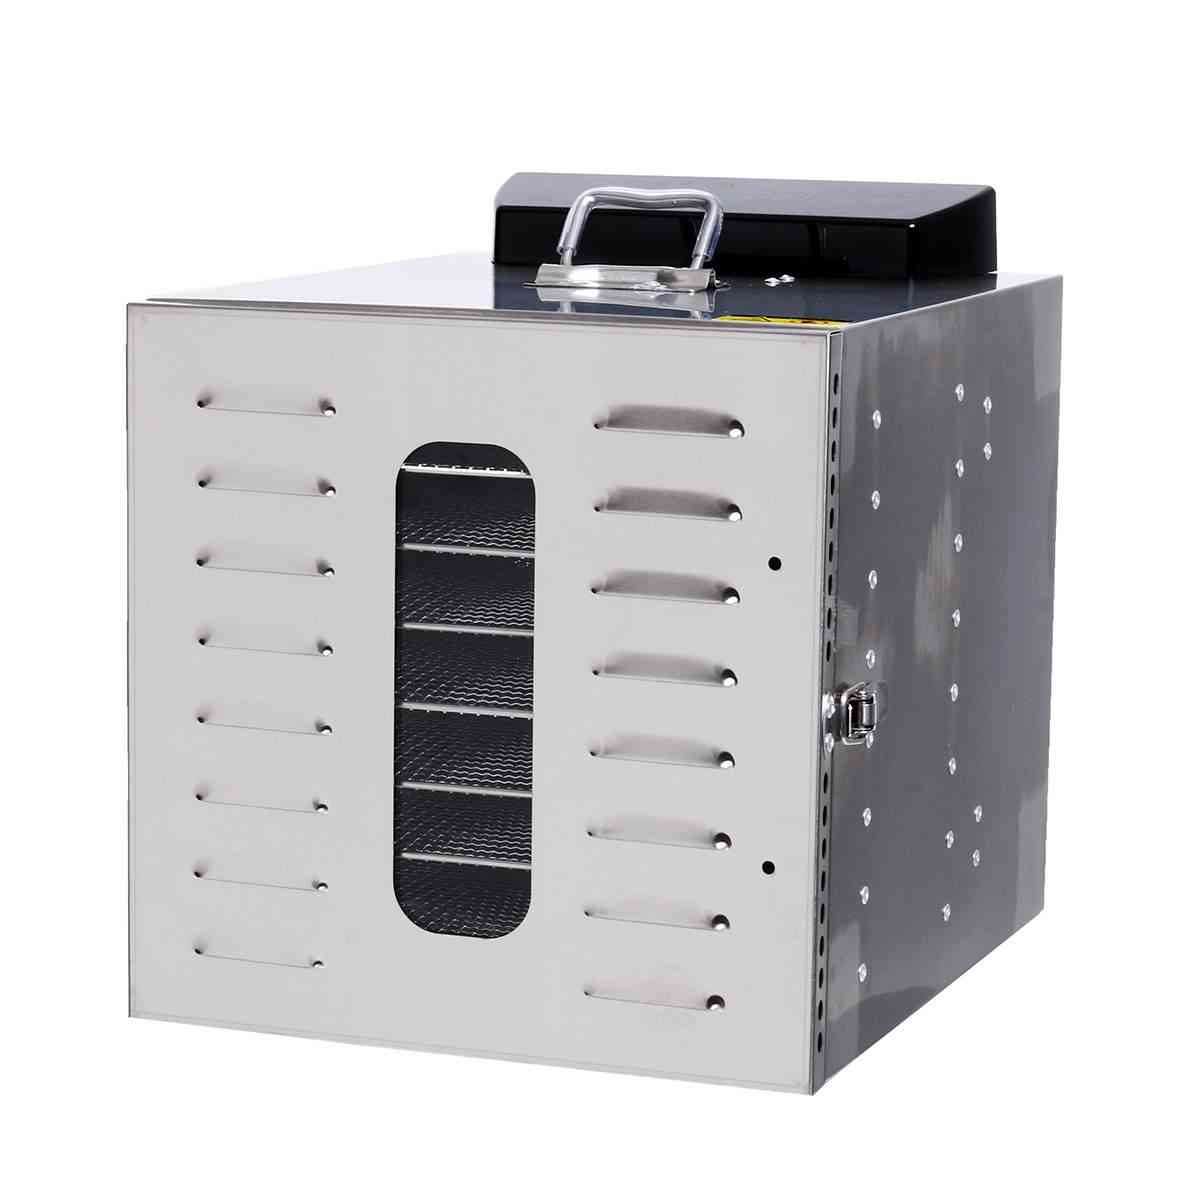 Fruit ,vegetable & Herb Meat Drying Machine, Stainless Steel Food Dryer